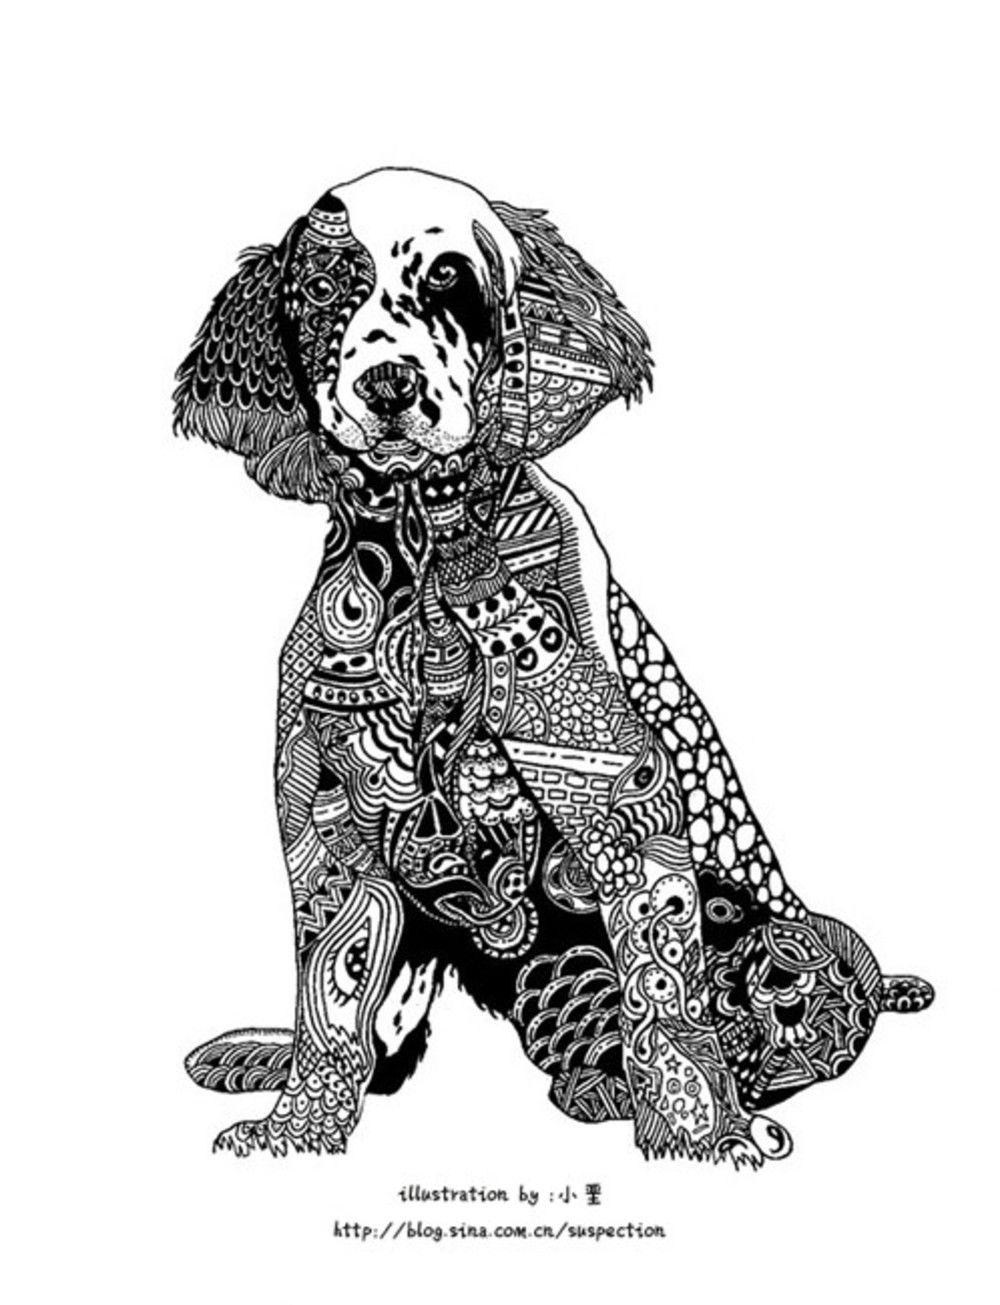 20120426161232 Tpsyy Thumb 1000 0 Jpeg 1000 1305 Zentangle Art Dog Coloring Page Dog Art